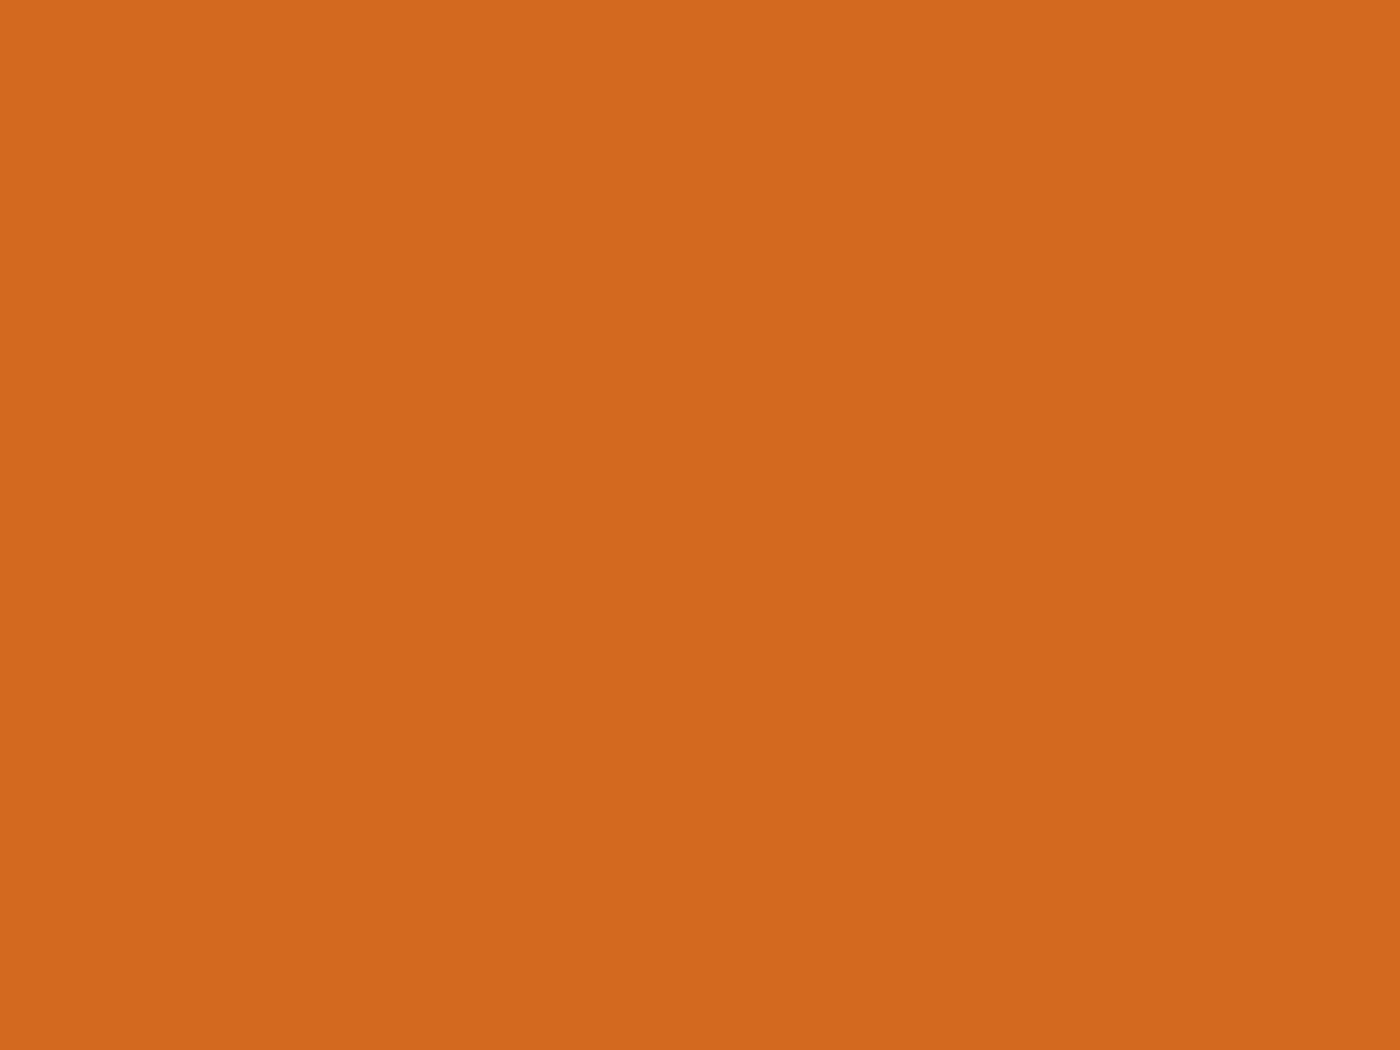 1400x1050 Cinnamon Solid Color Background